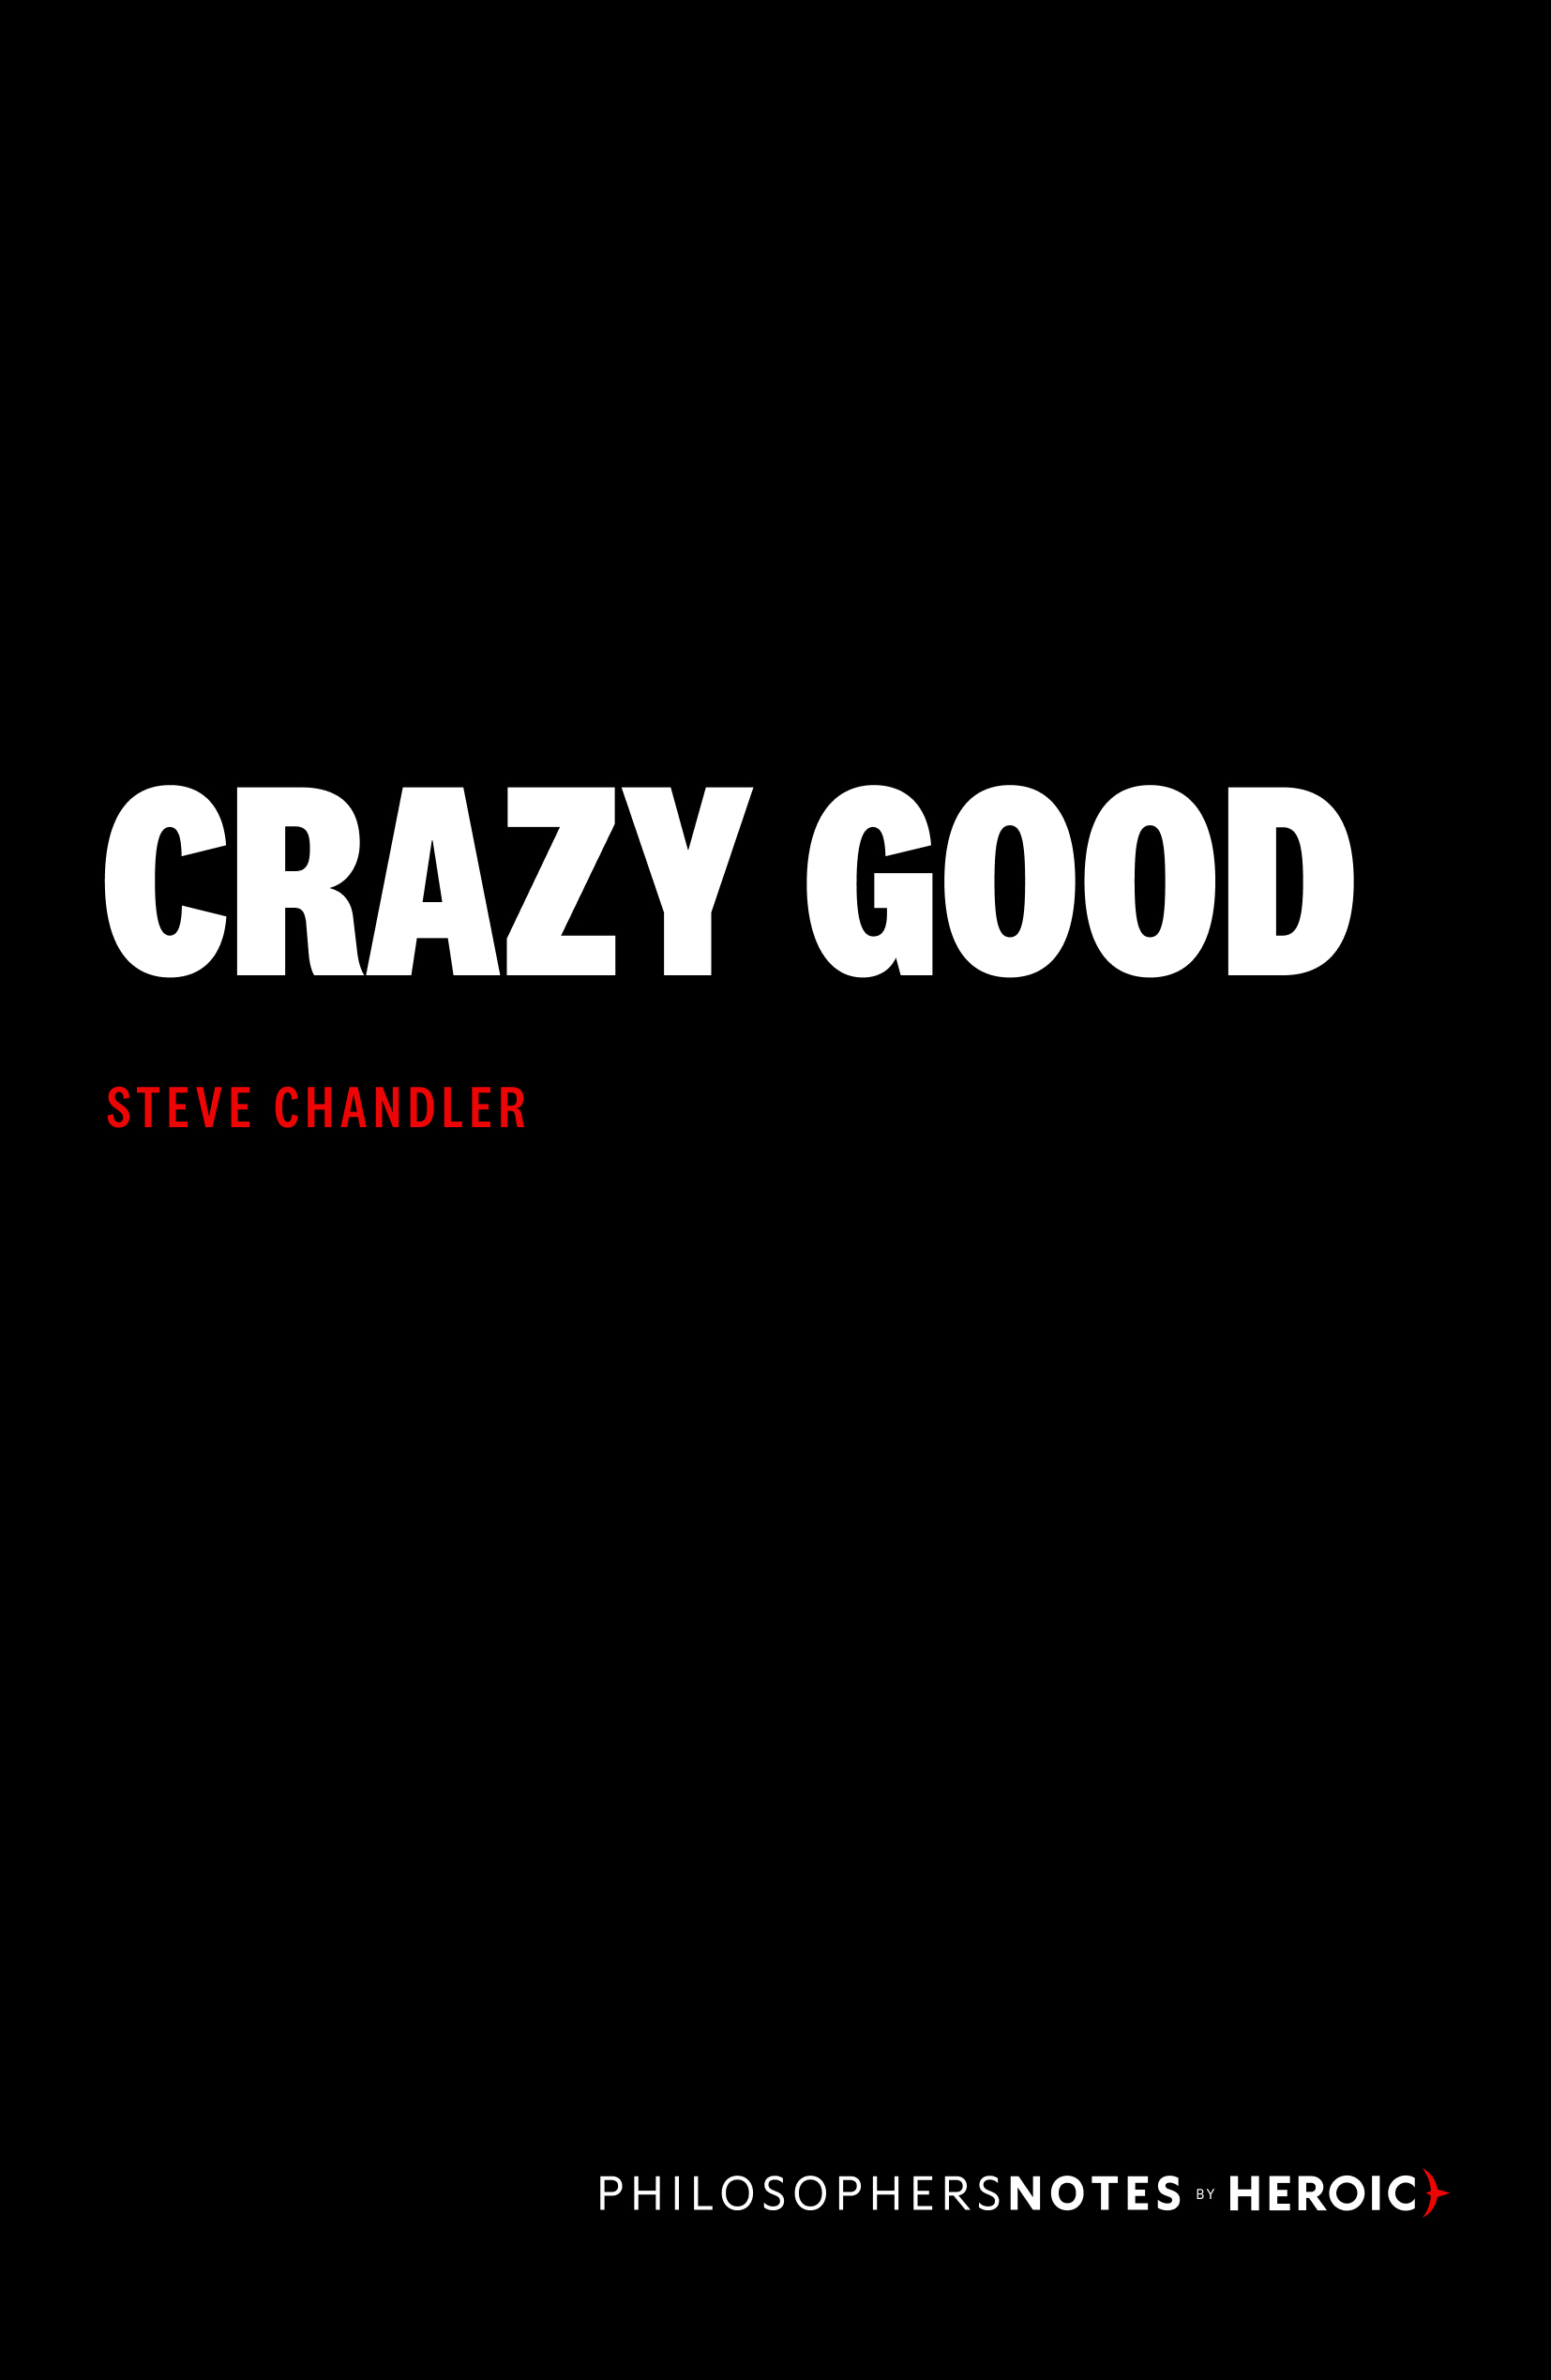 Crazy Good Book Cover